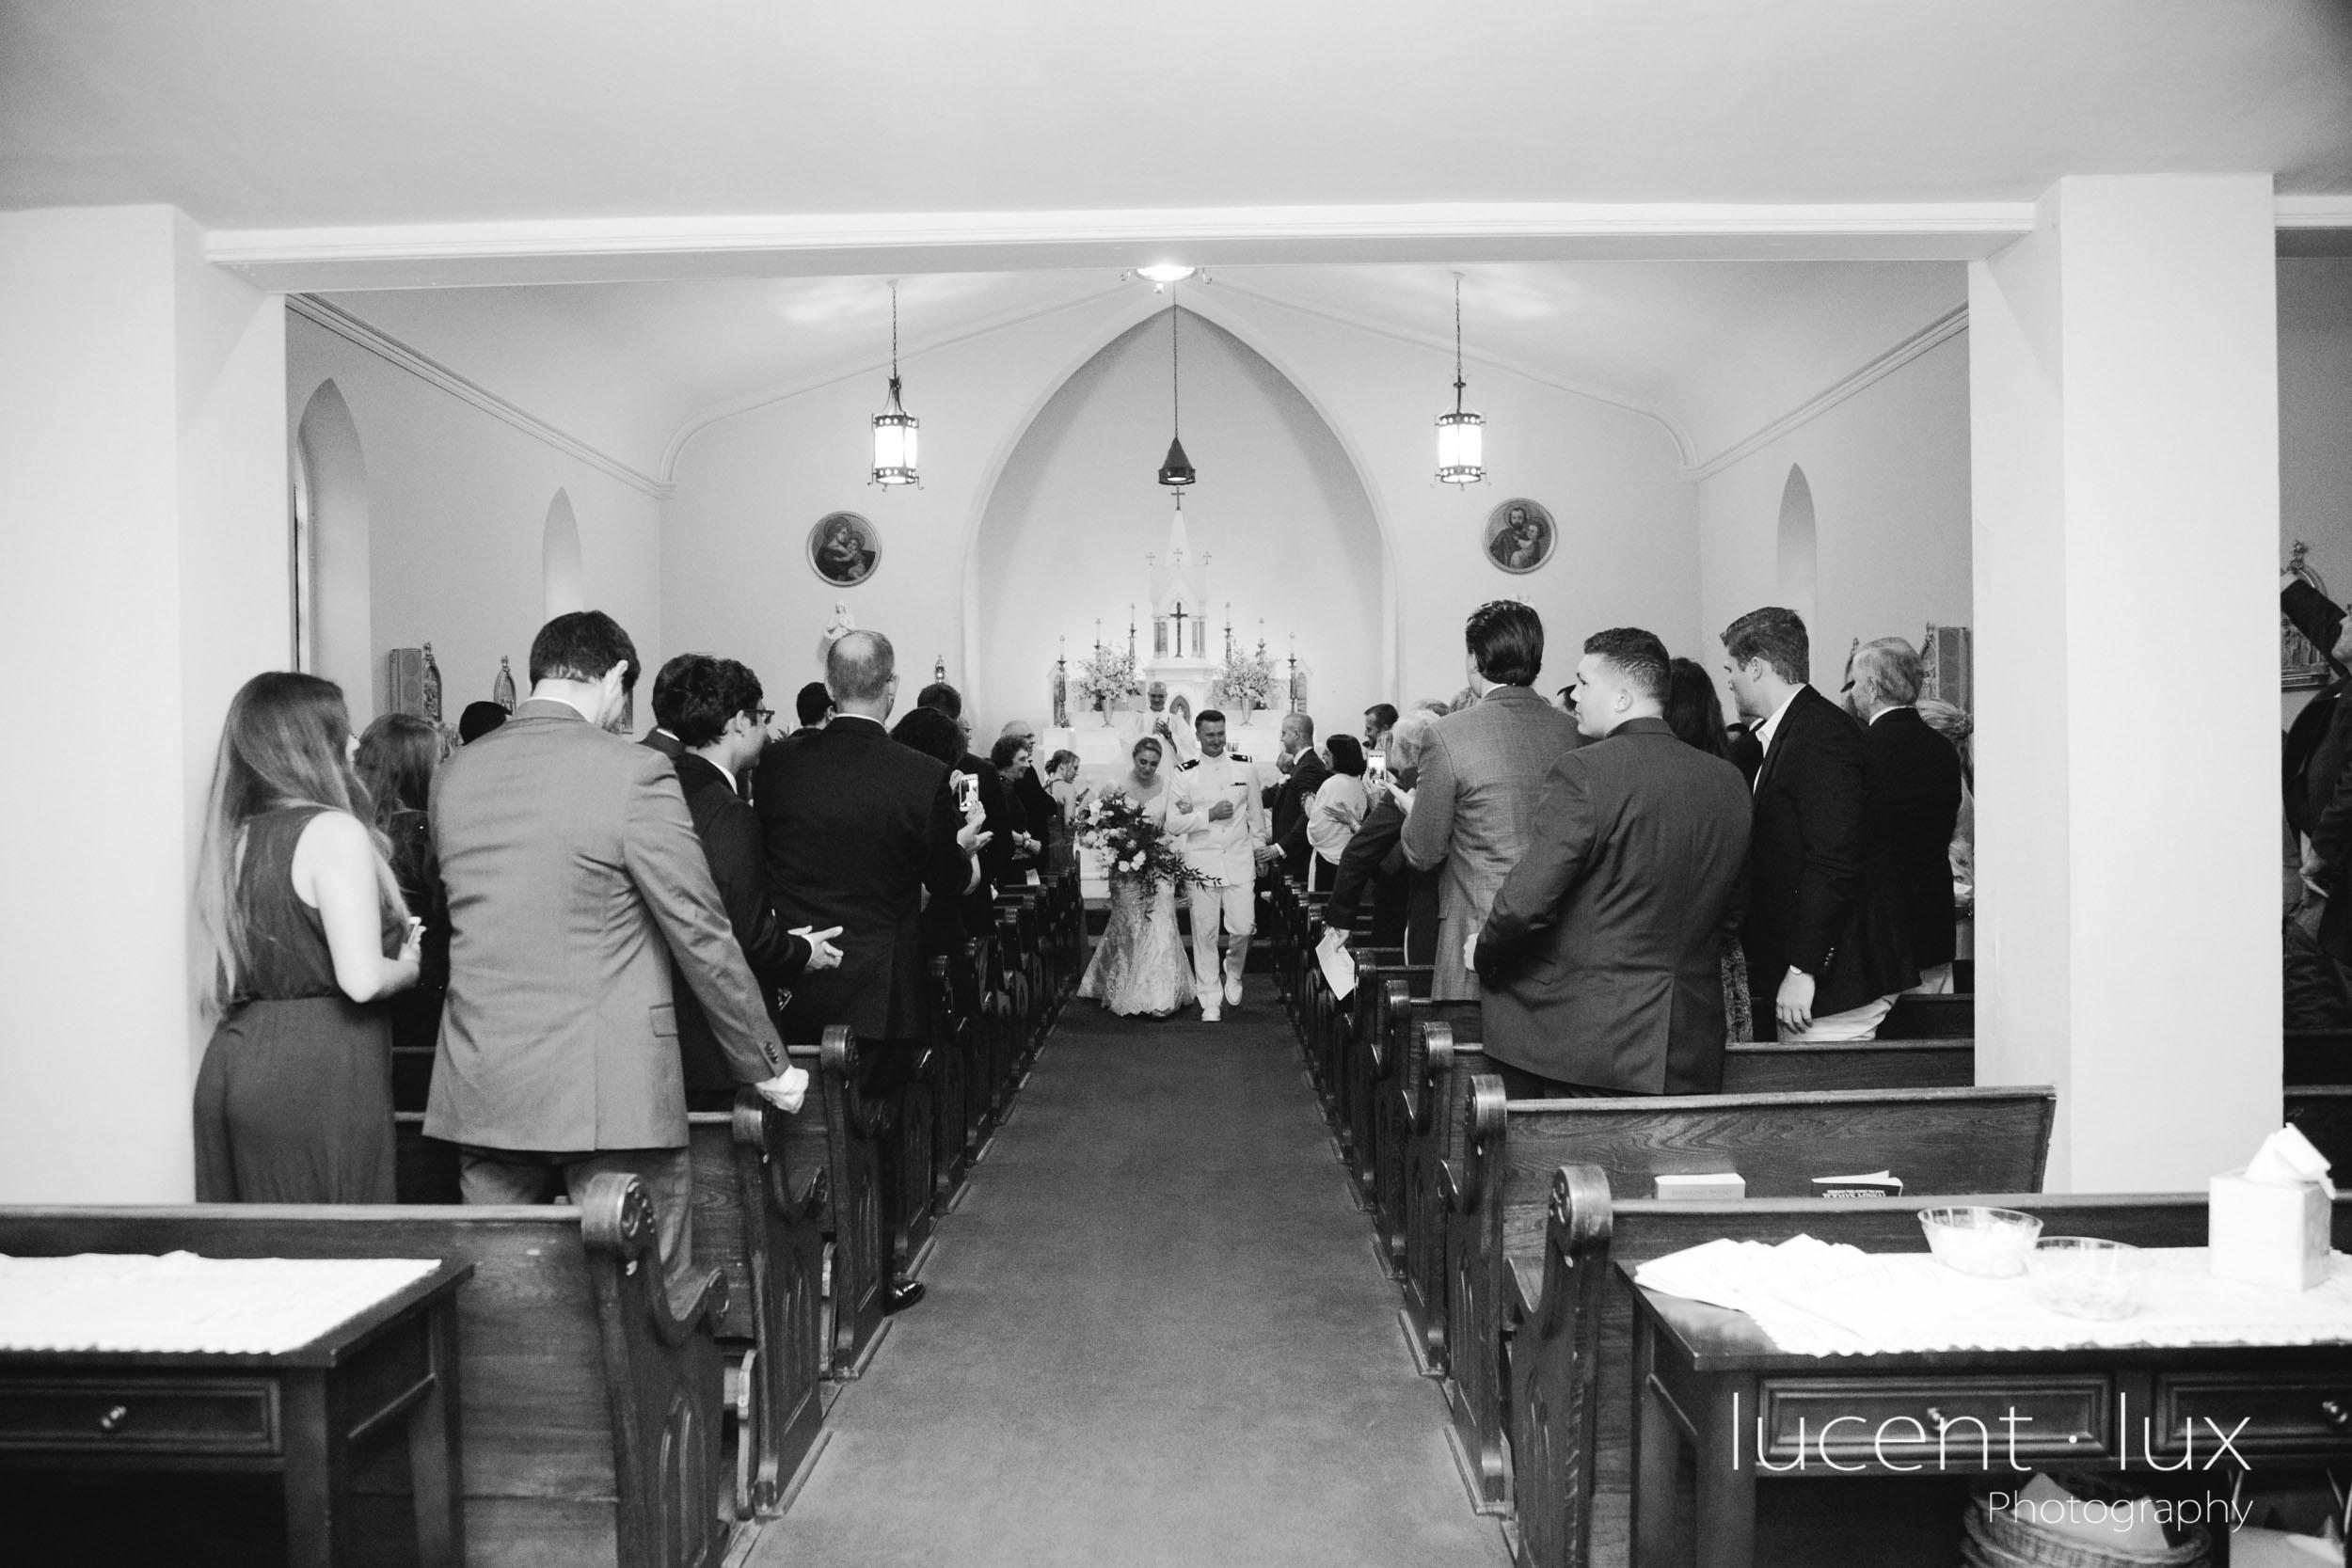 Wedding-Photography-Maryland-Pennsylvania-Photographer-Mendenhall-Inn-Media-Portrait-Event-201.jpg